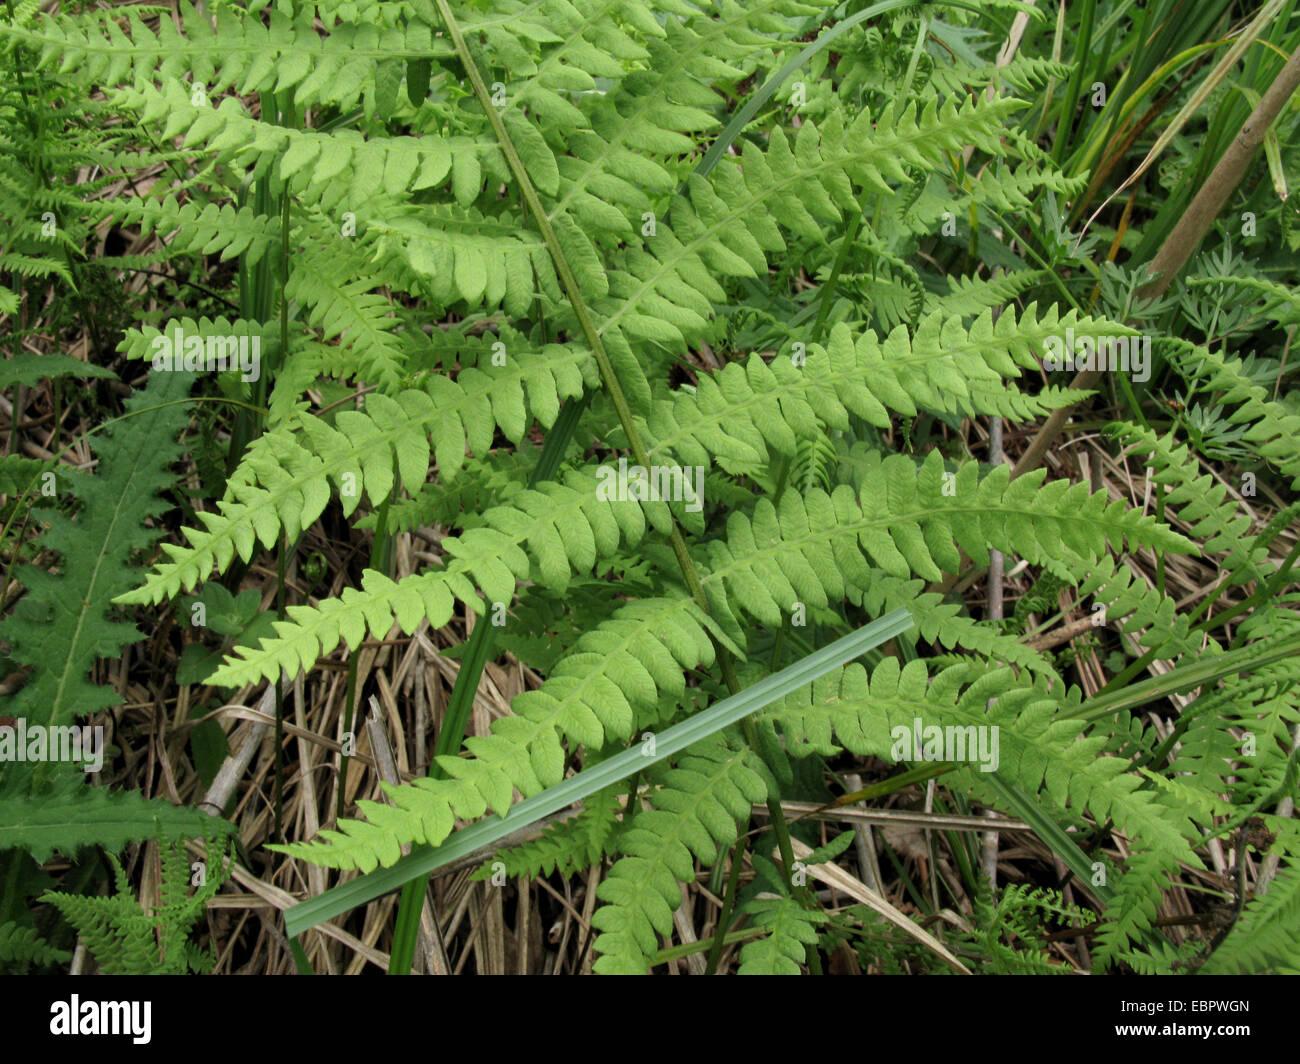 marsh fern (Thelypteris palustris), detail of a frond, Germany, North Rhine-Westphalia - Stock Image